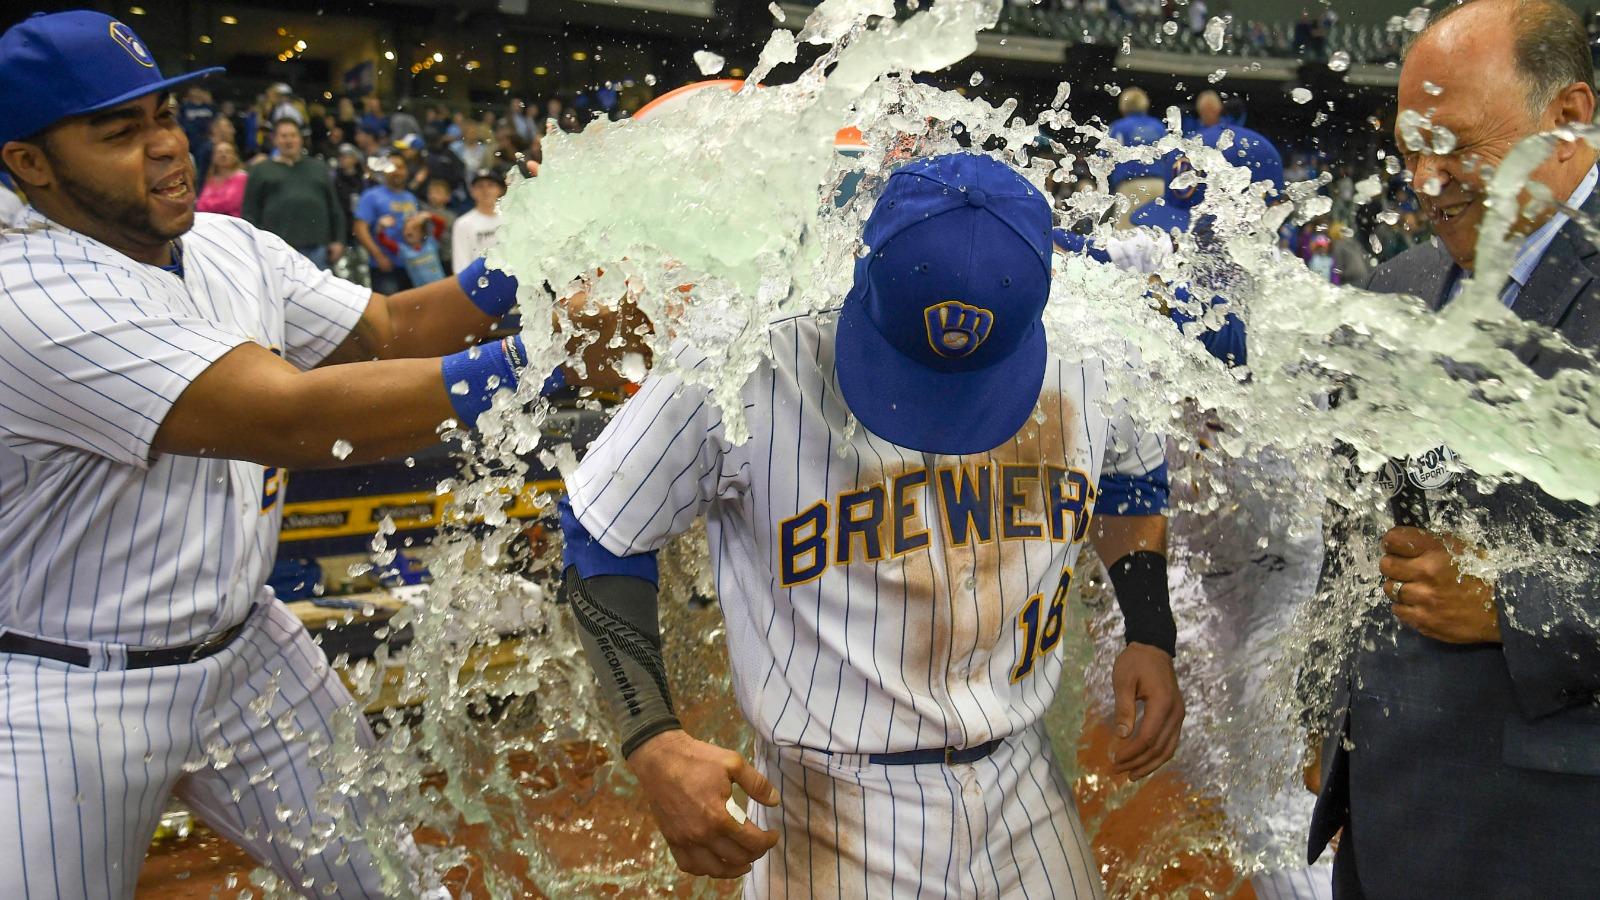 051317-MLB-Brewers-PI